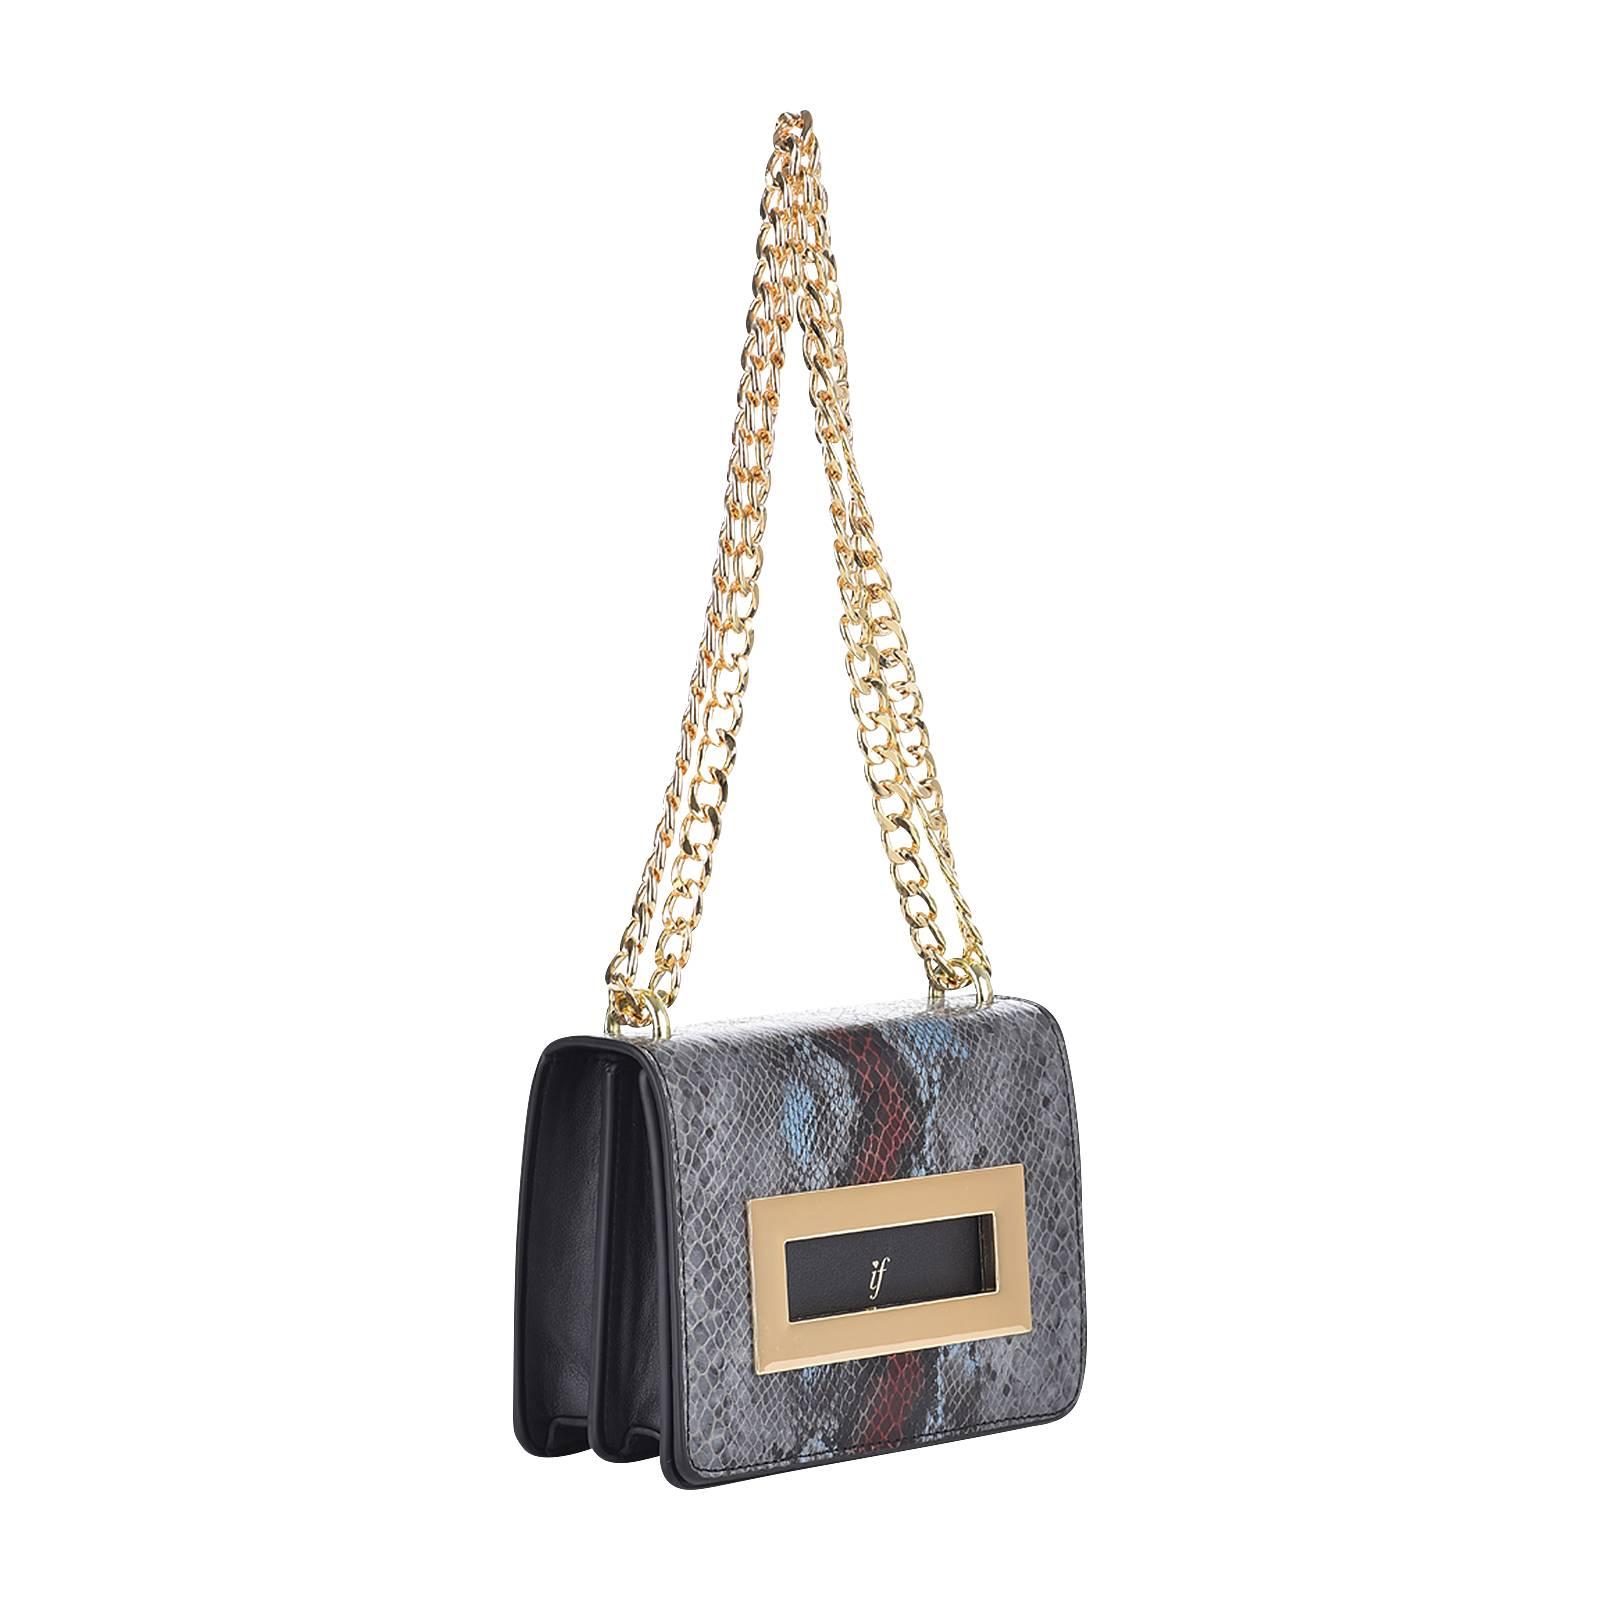 Tess - Γυναικεία τσάντα If από δερμα φιδι συνθετικο και δερμα ... 41d87cbc193